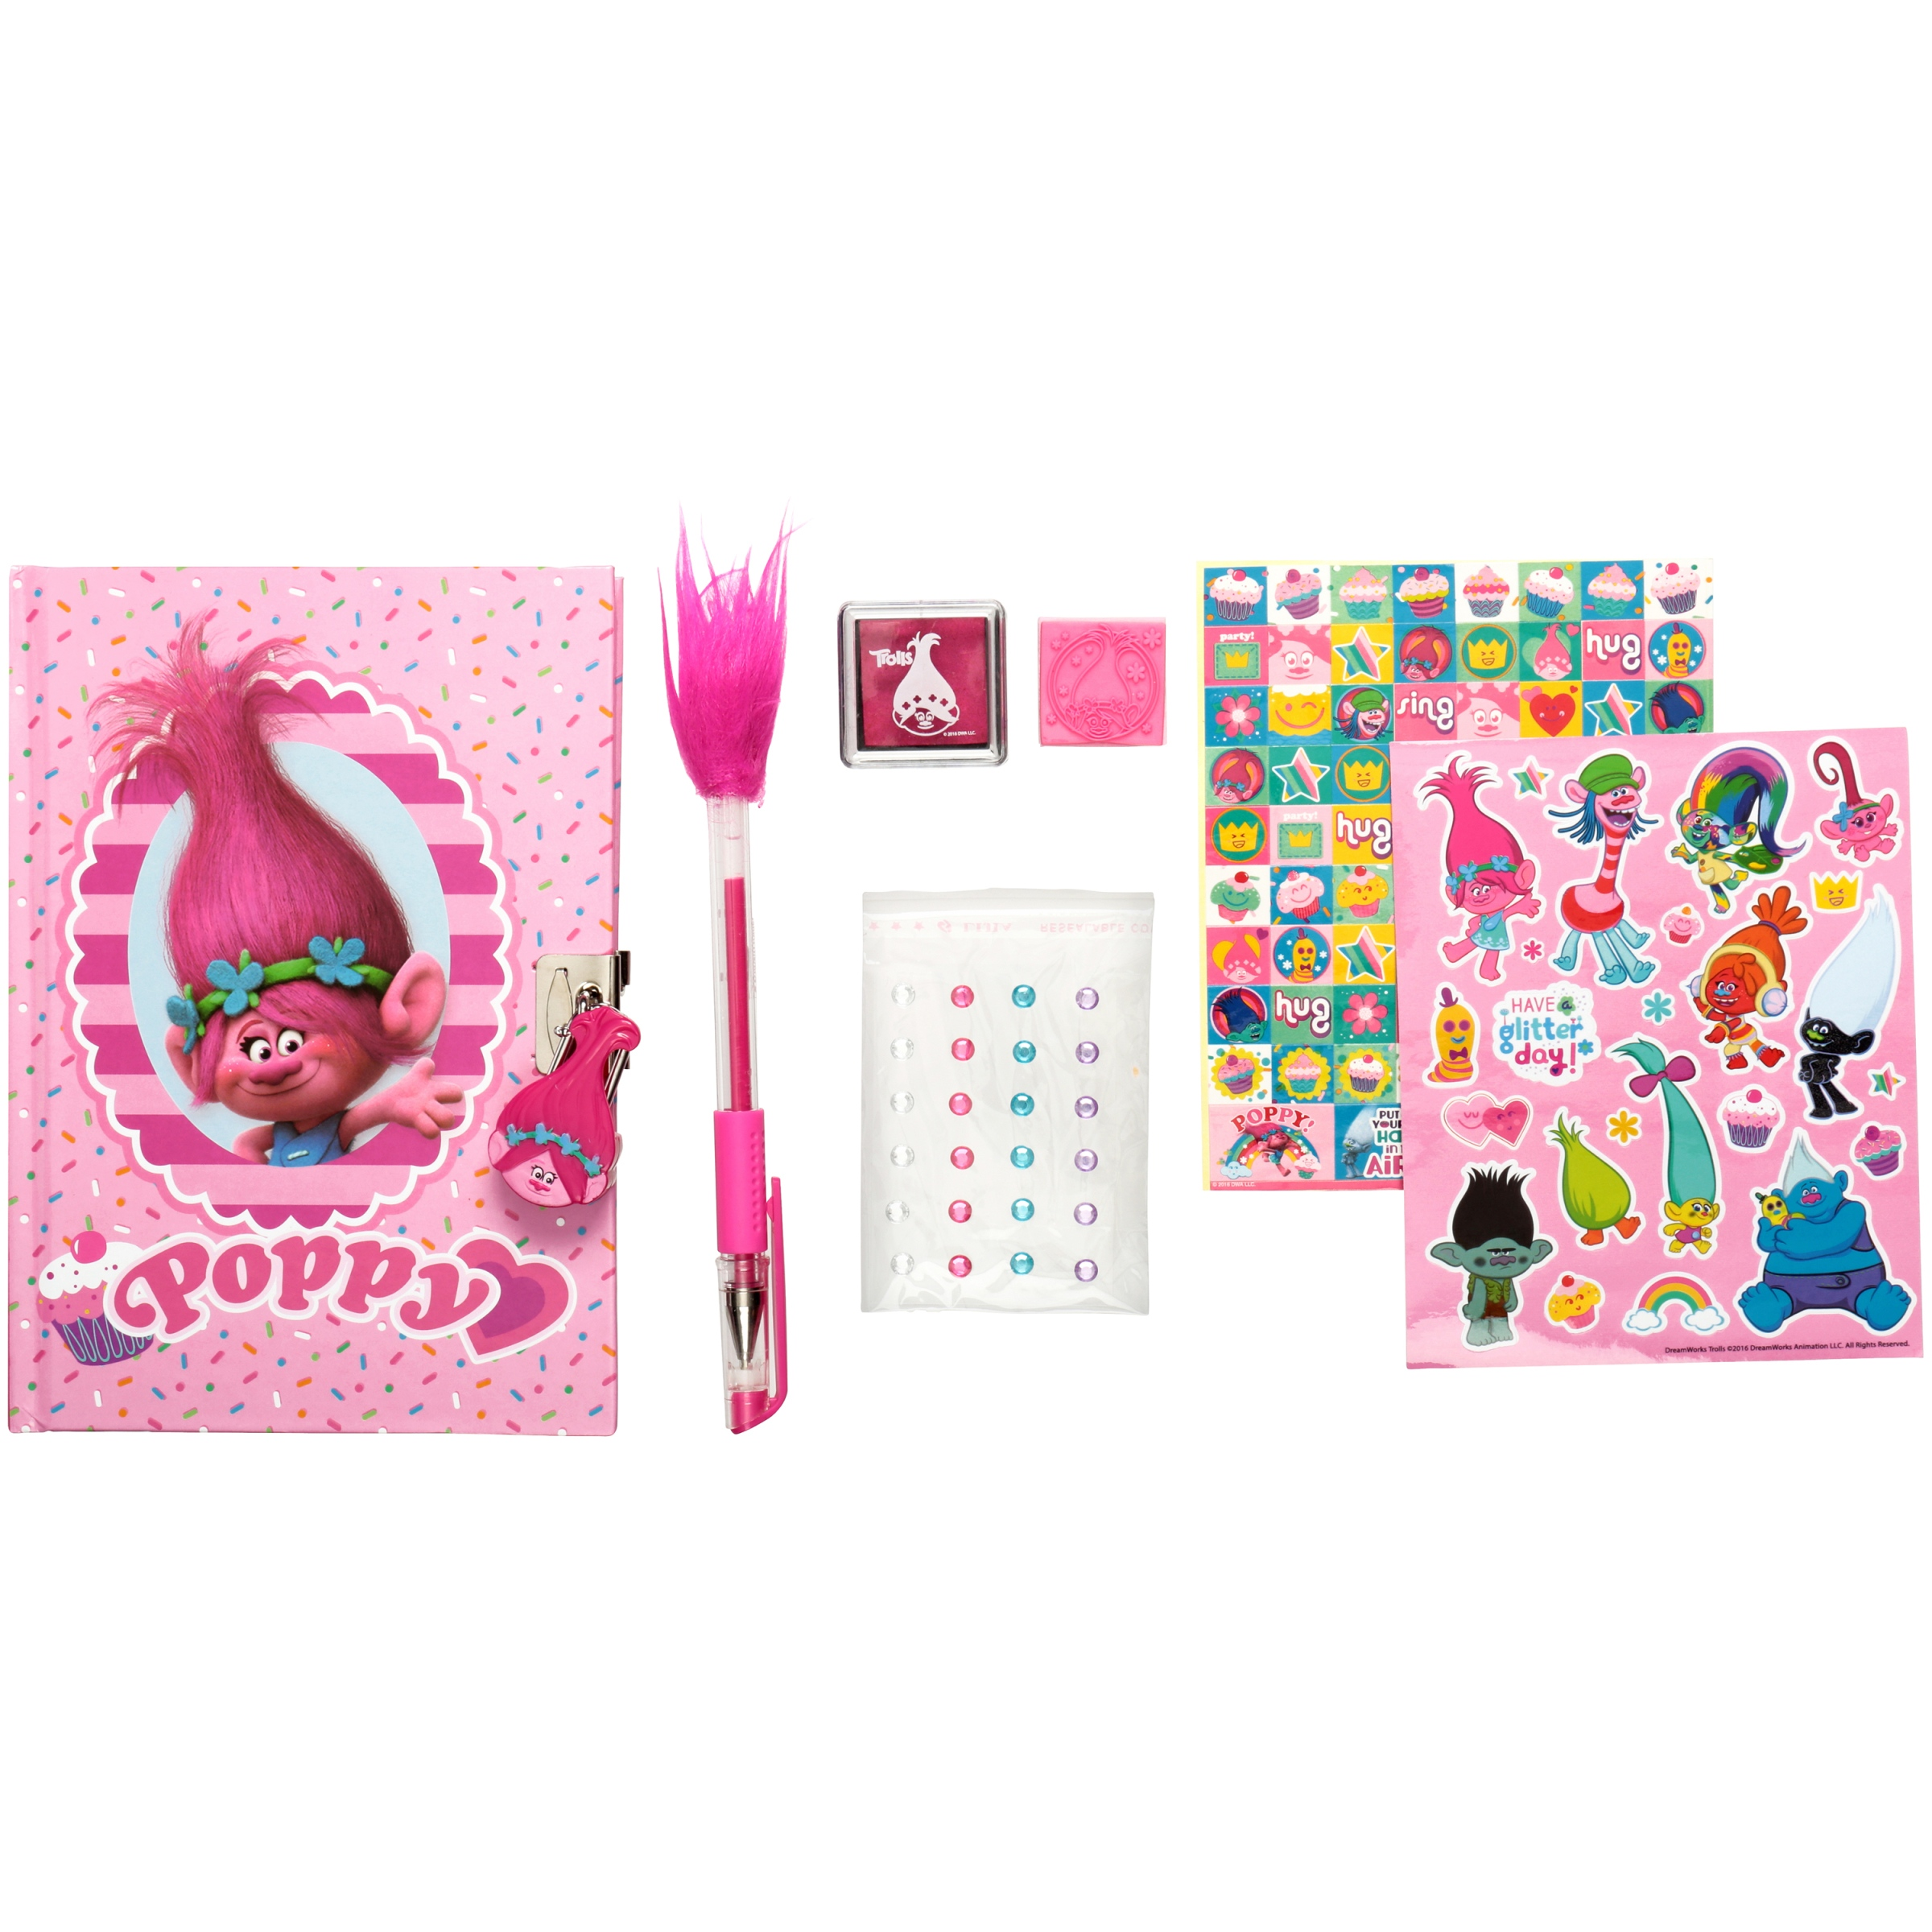 Cra-Z-Art Dreamworks Trolls Lock & Key Secret Diary 6 pc Box by Retail Marketing District Corp.